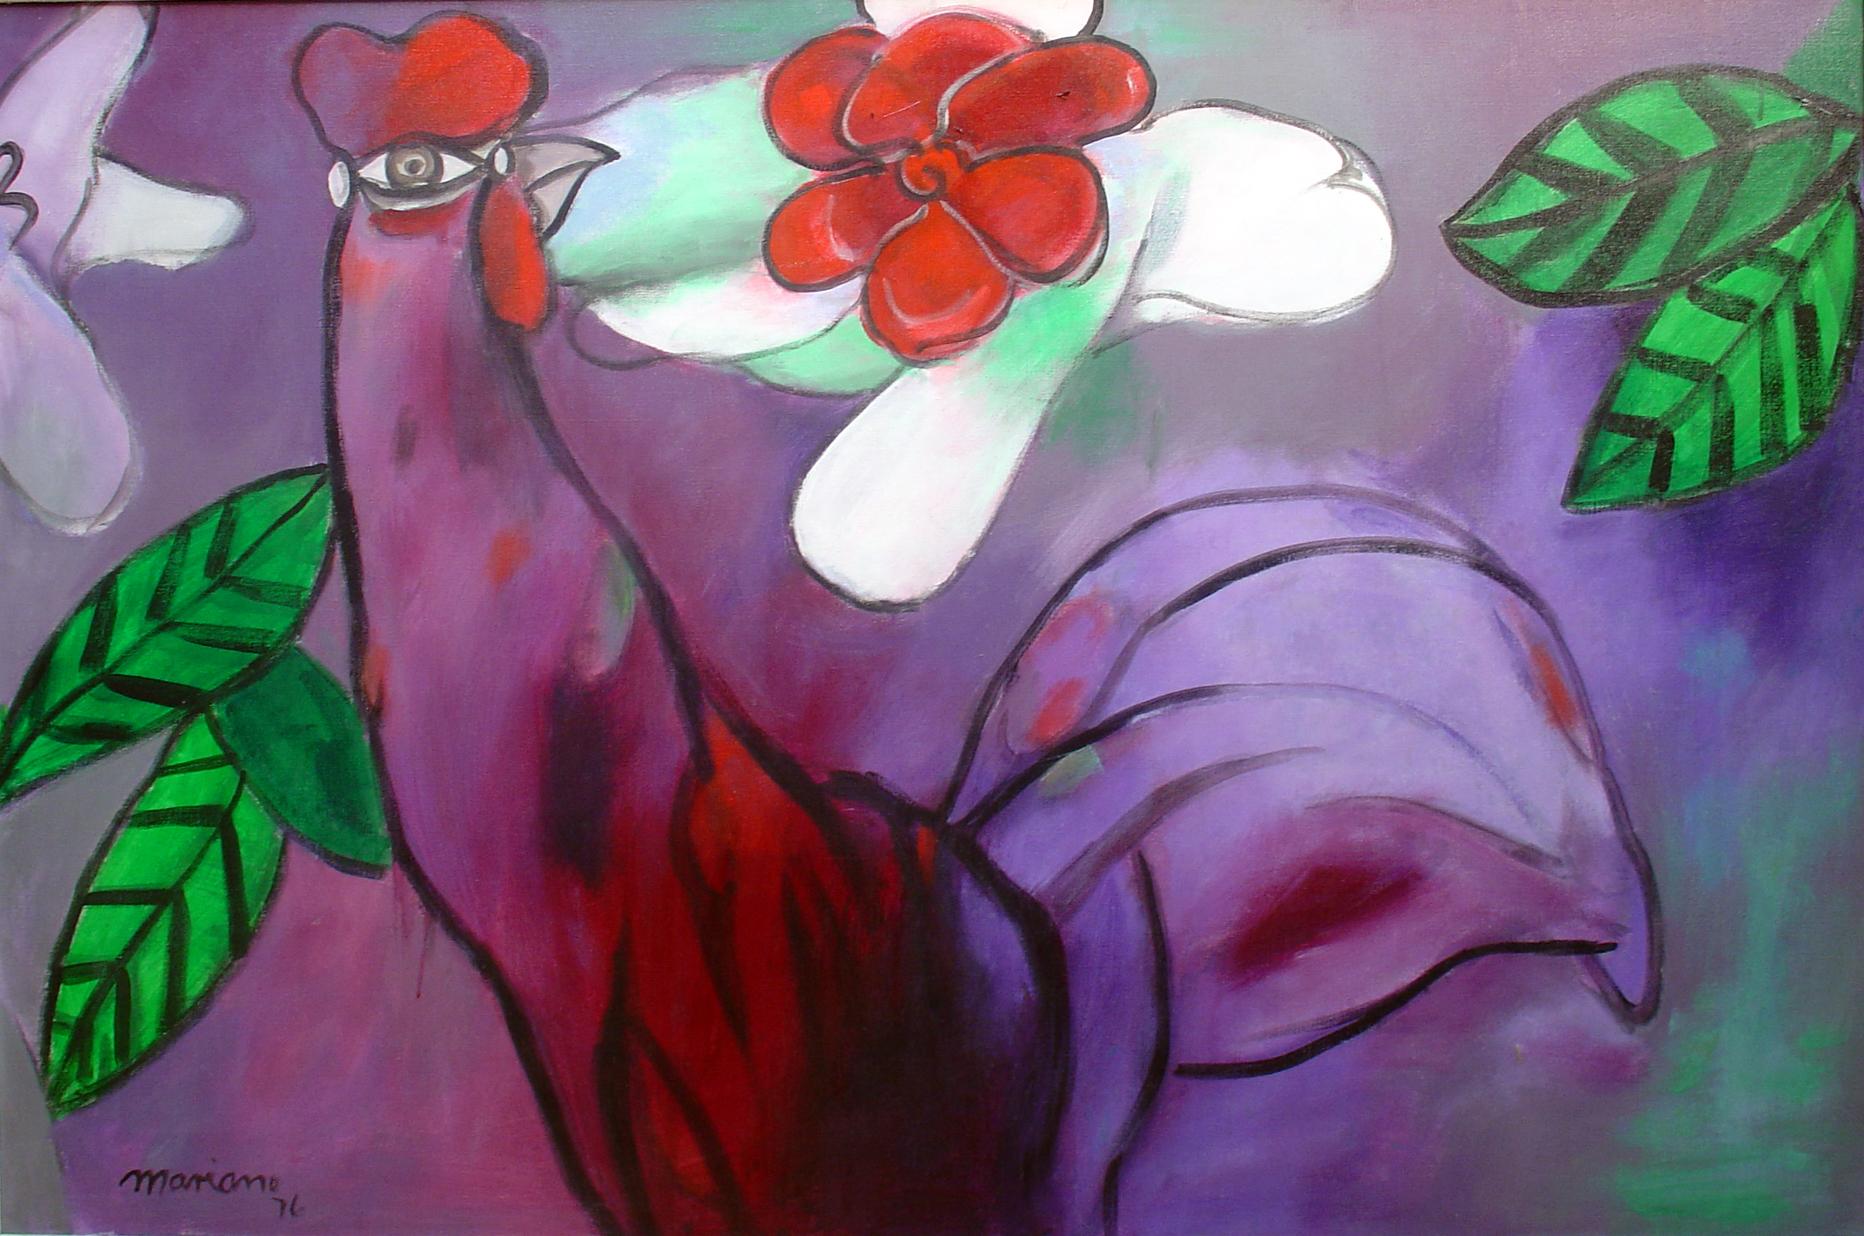 alt Rooster and Flower (Gallo y Flor)